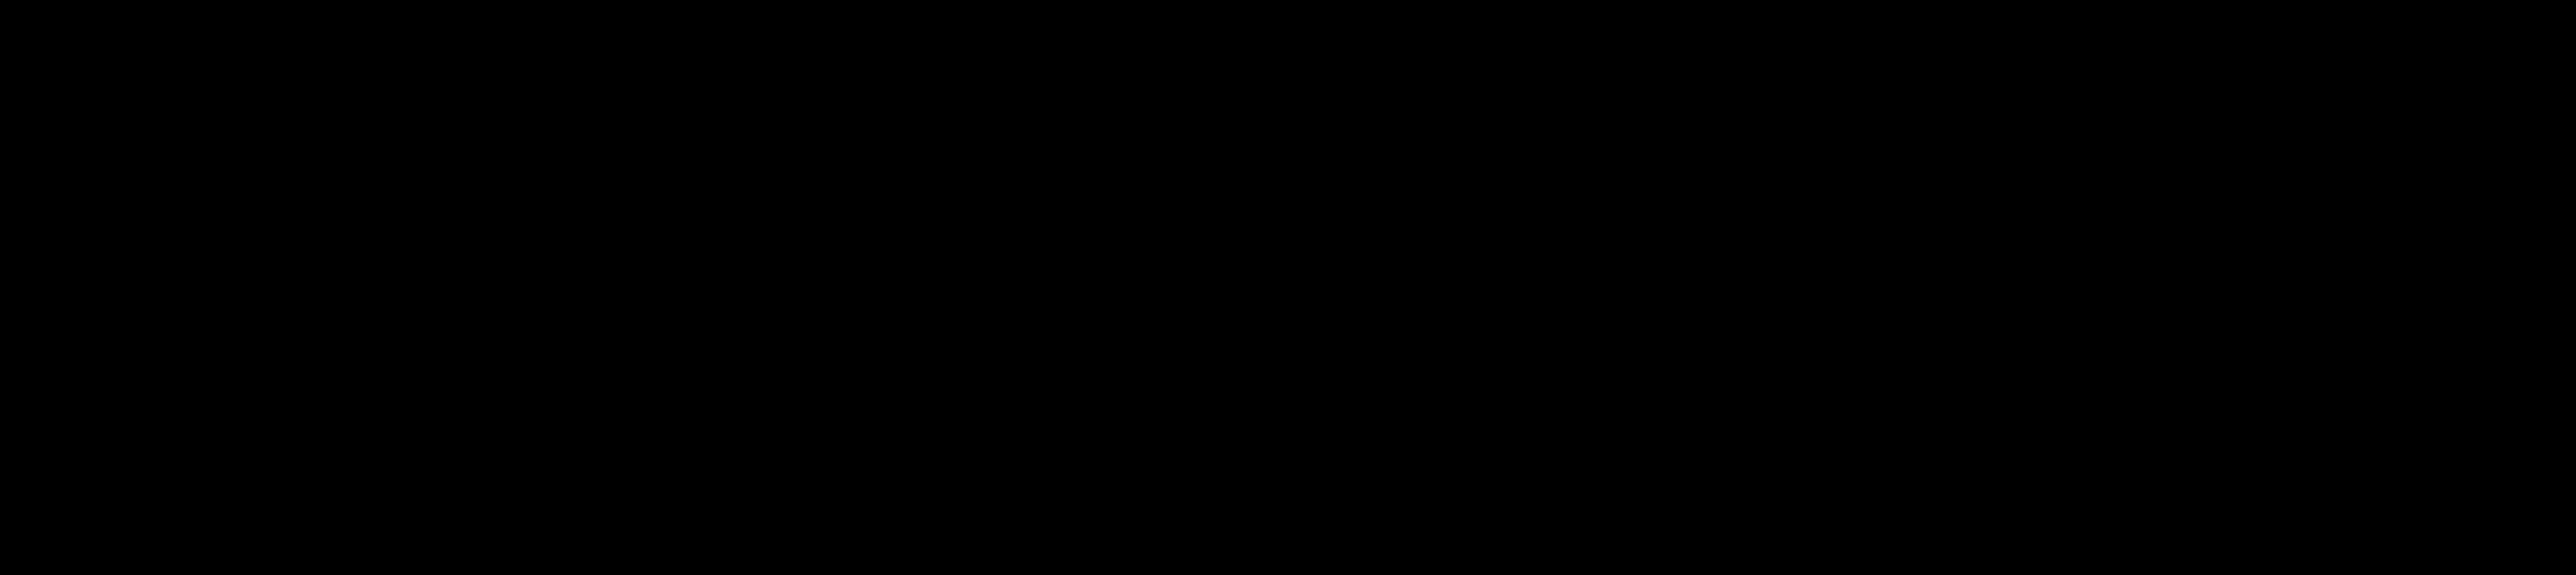 Thick Skin logo